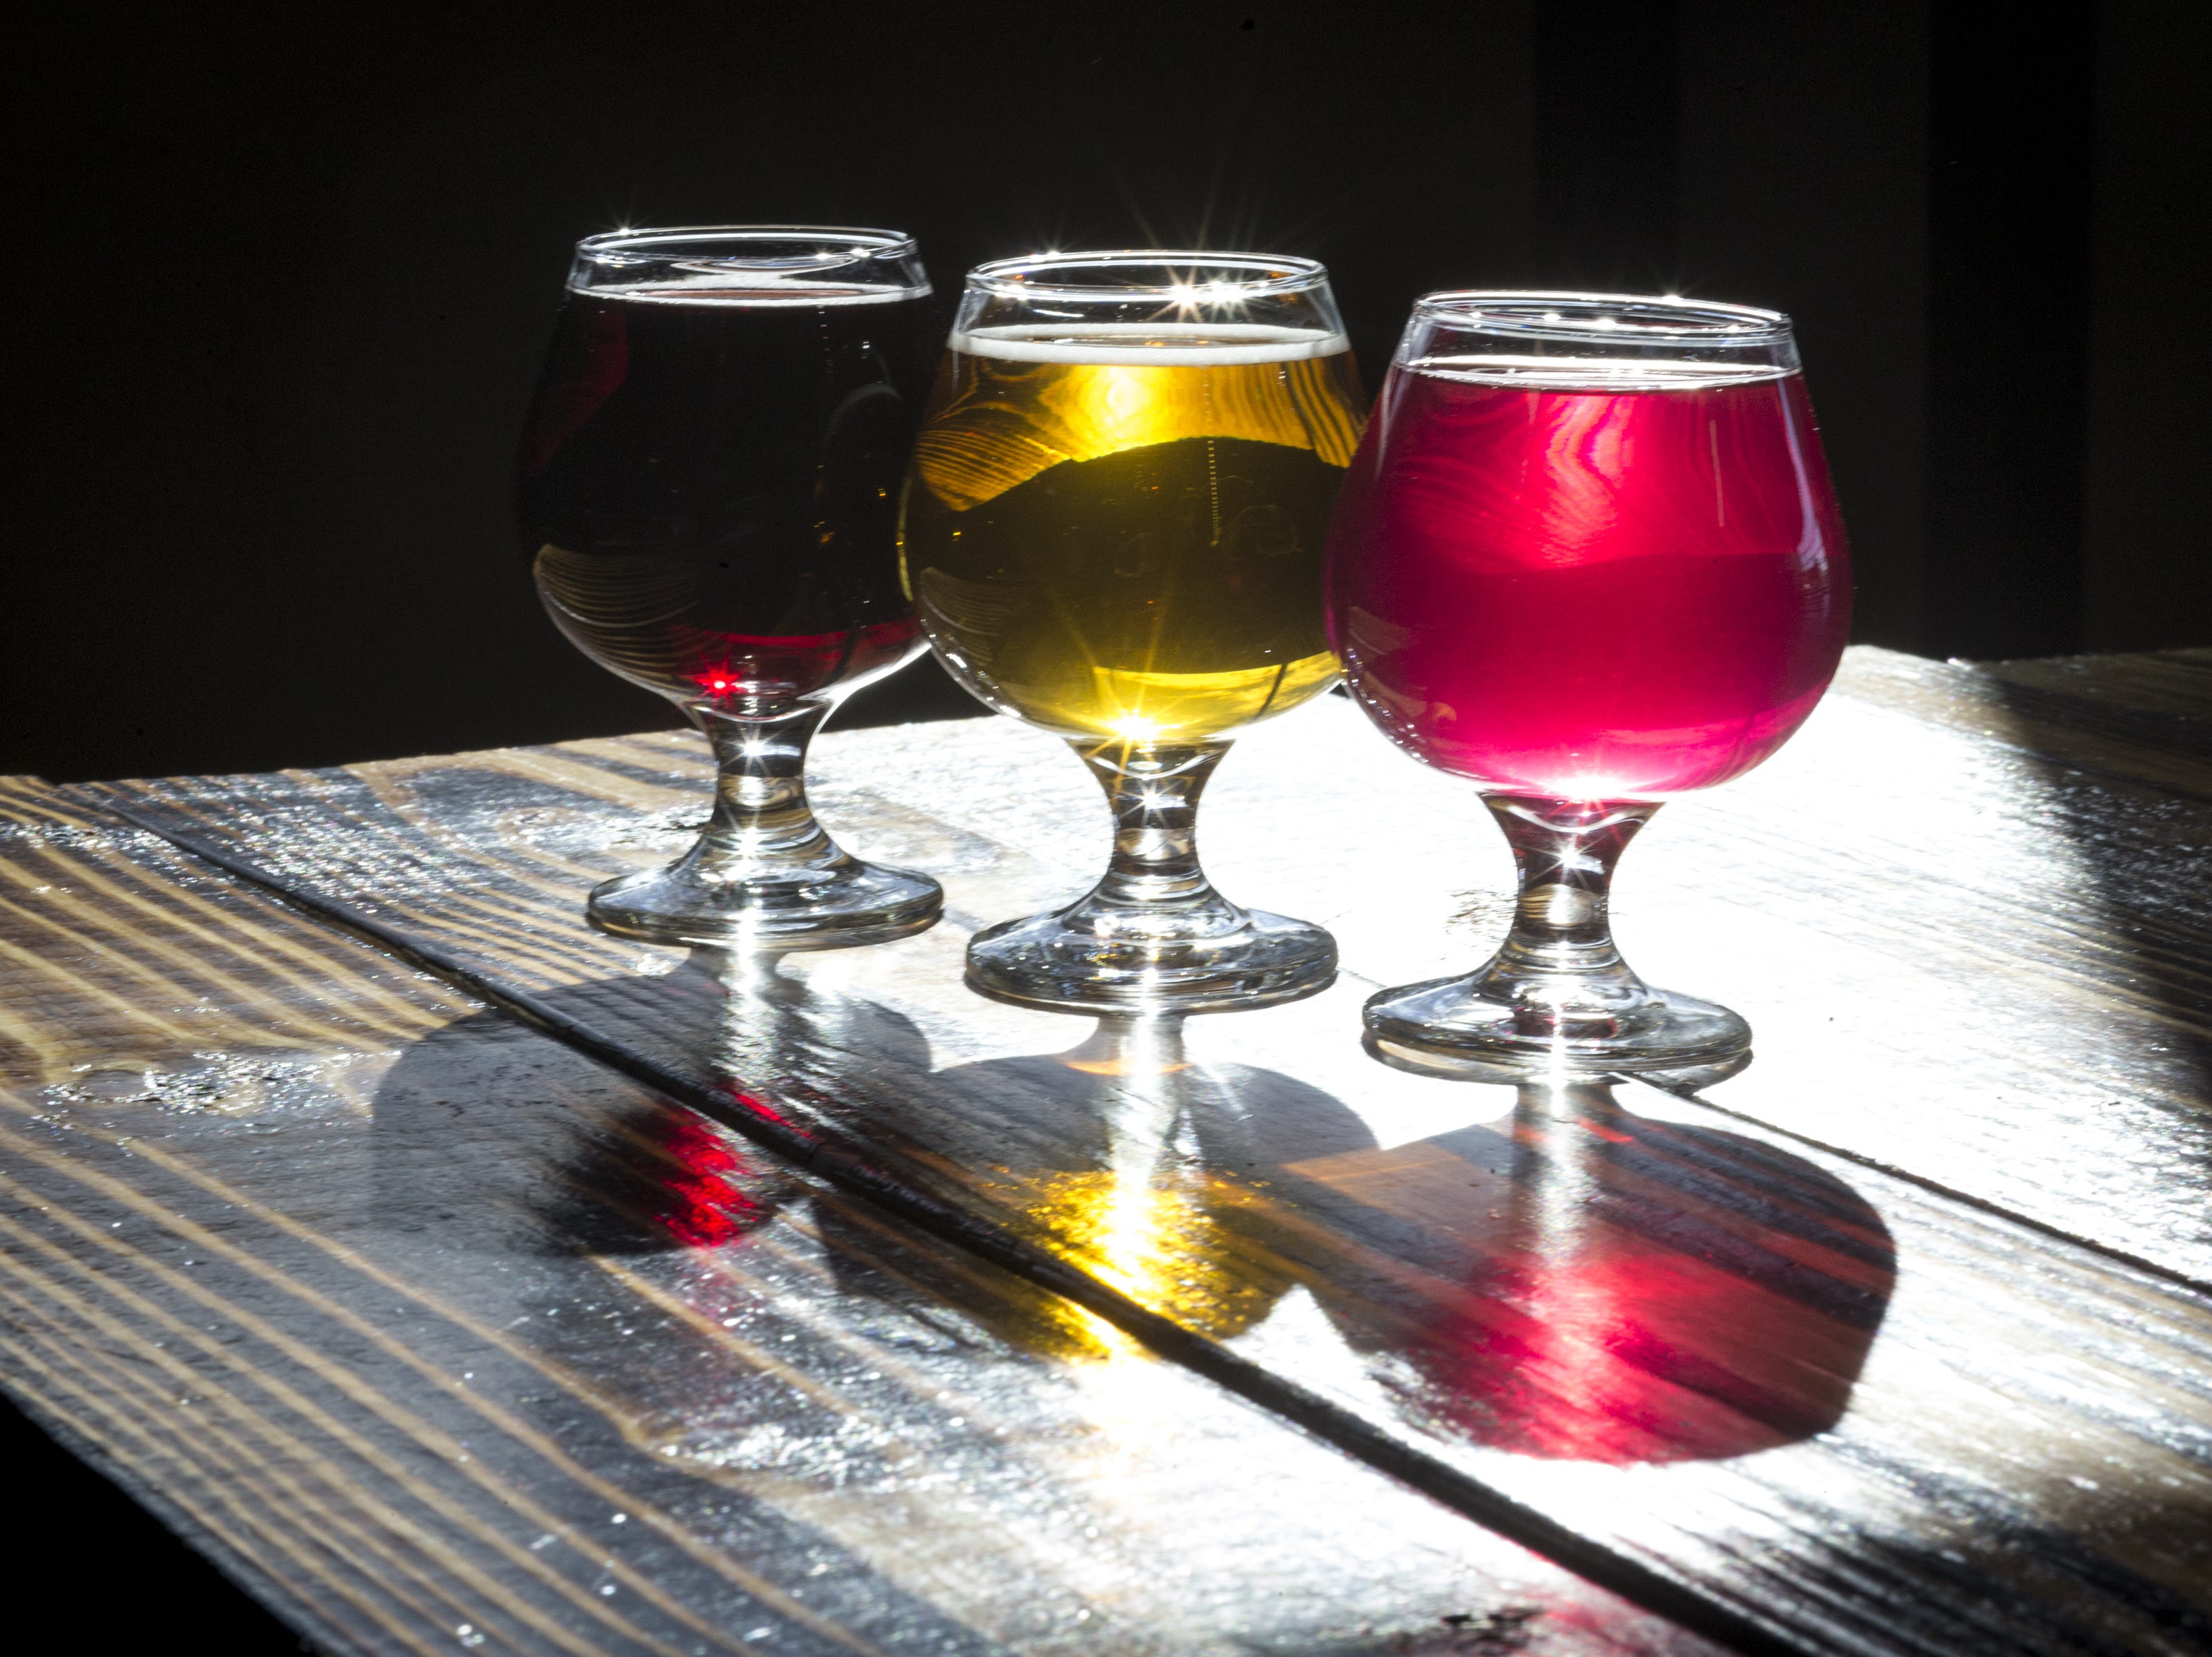 Cider, Dec. 5, 2018, at Cider Corps, 31 S. Robson, Mesa.